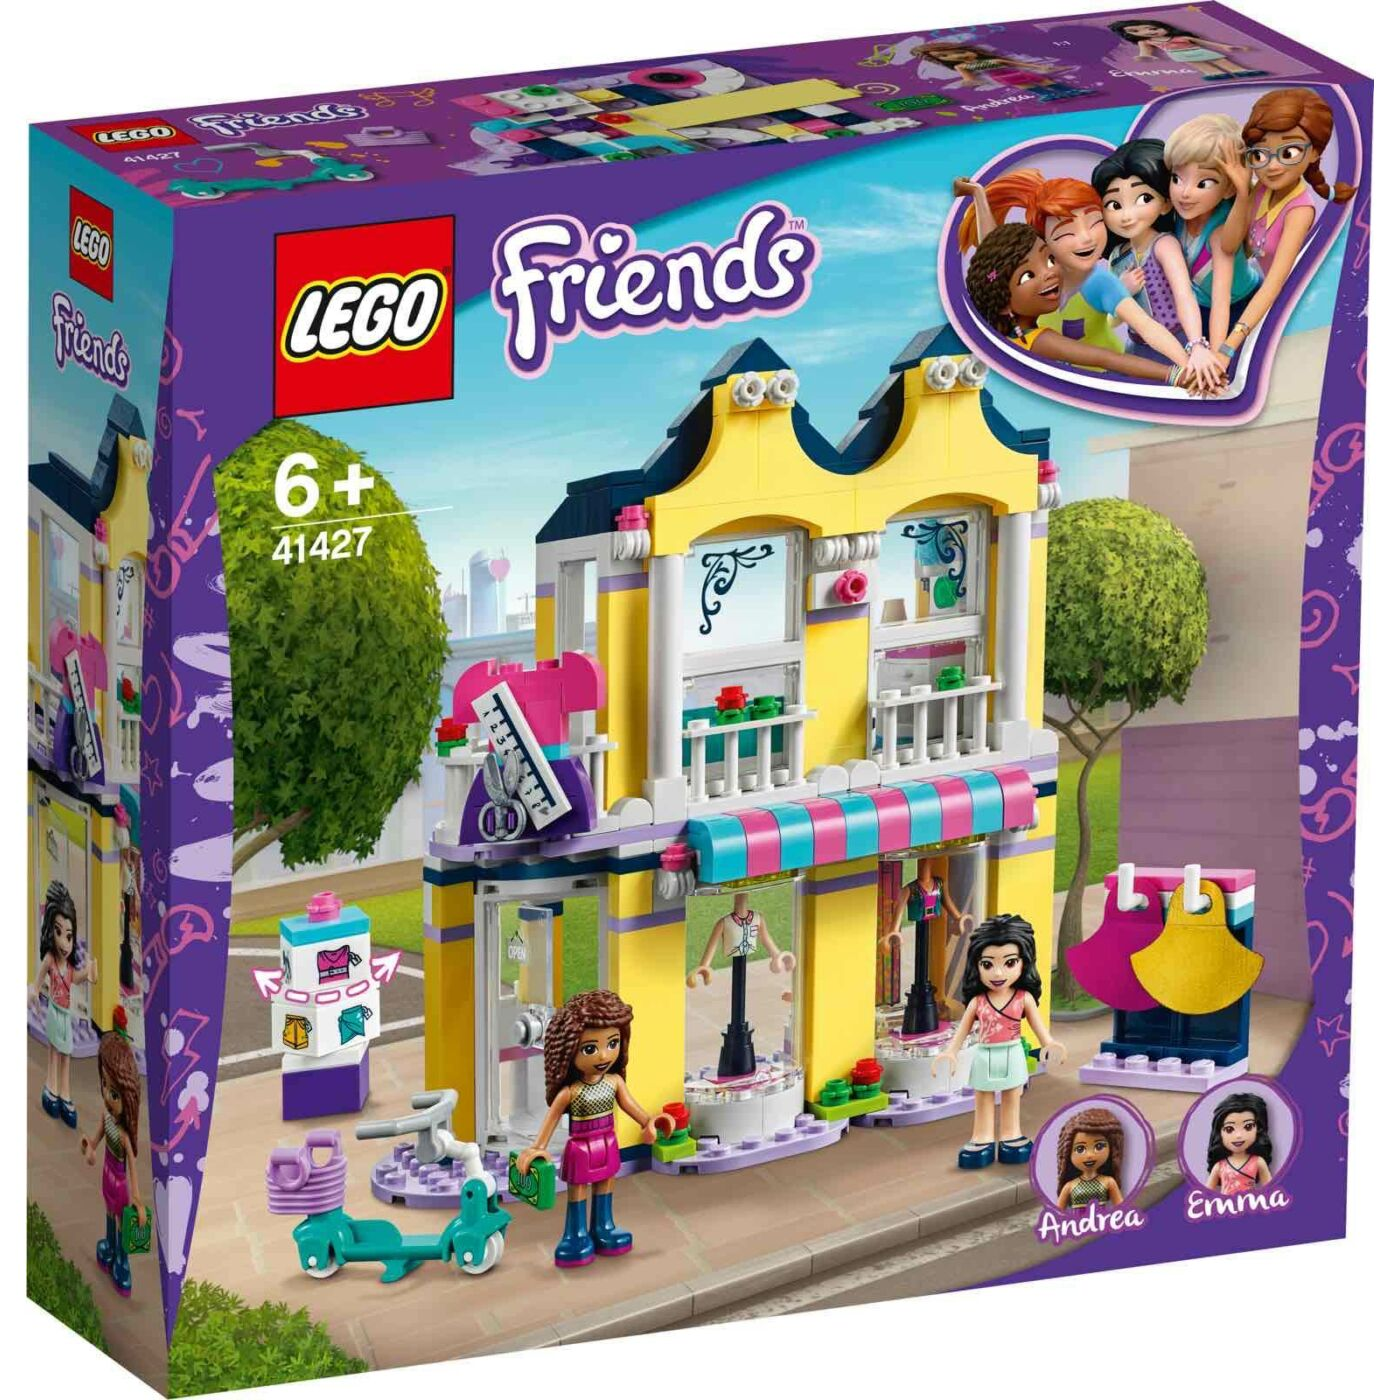 Lego Friends Emma ruhaboltja